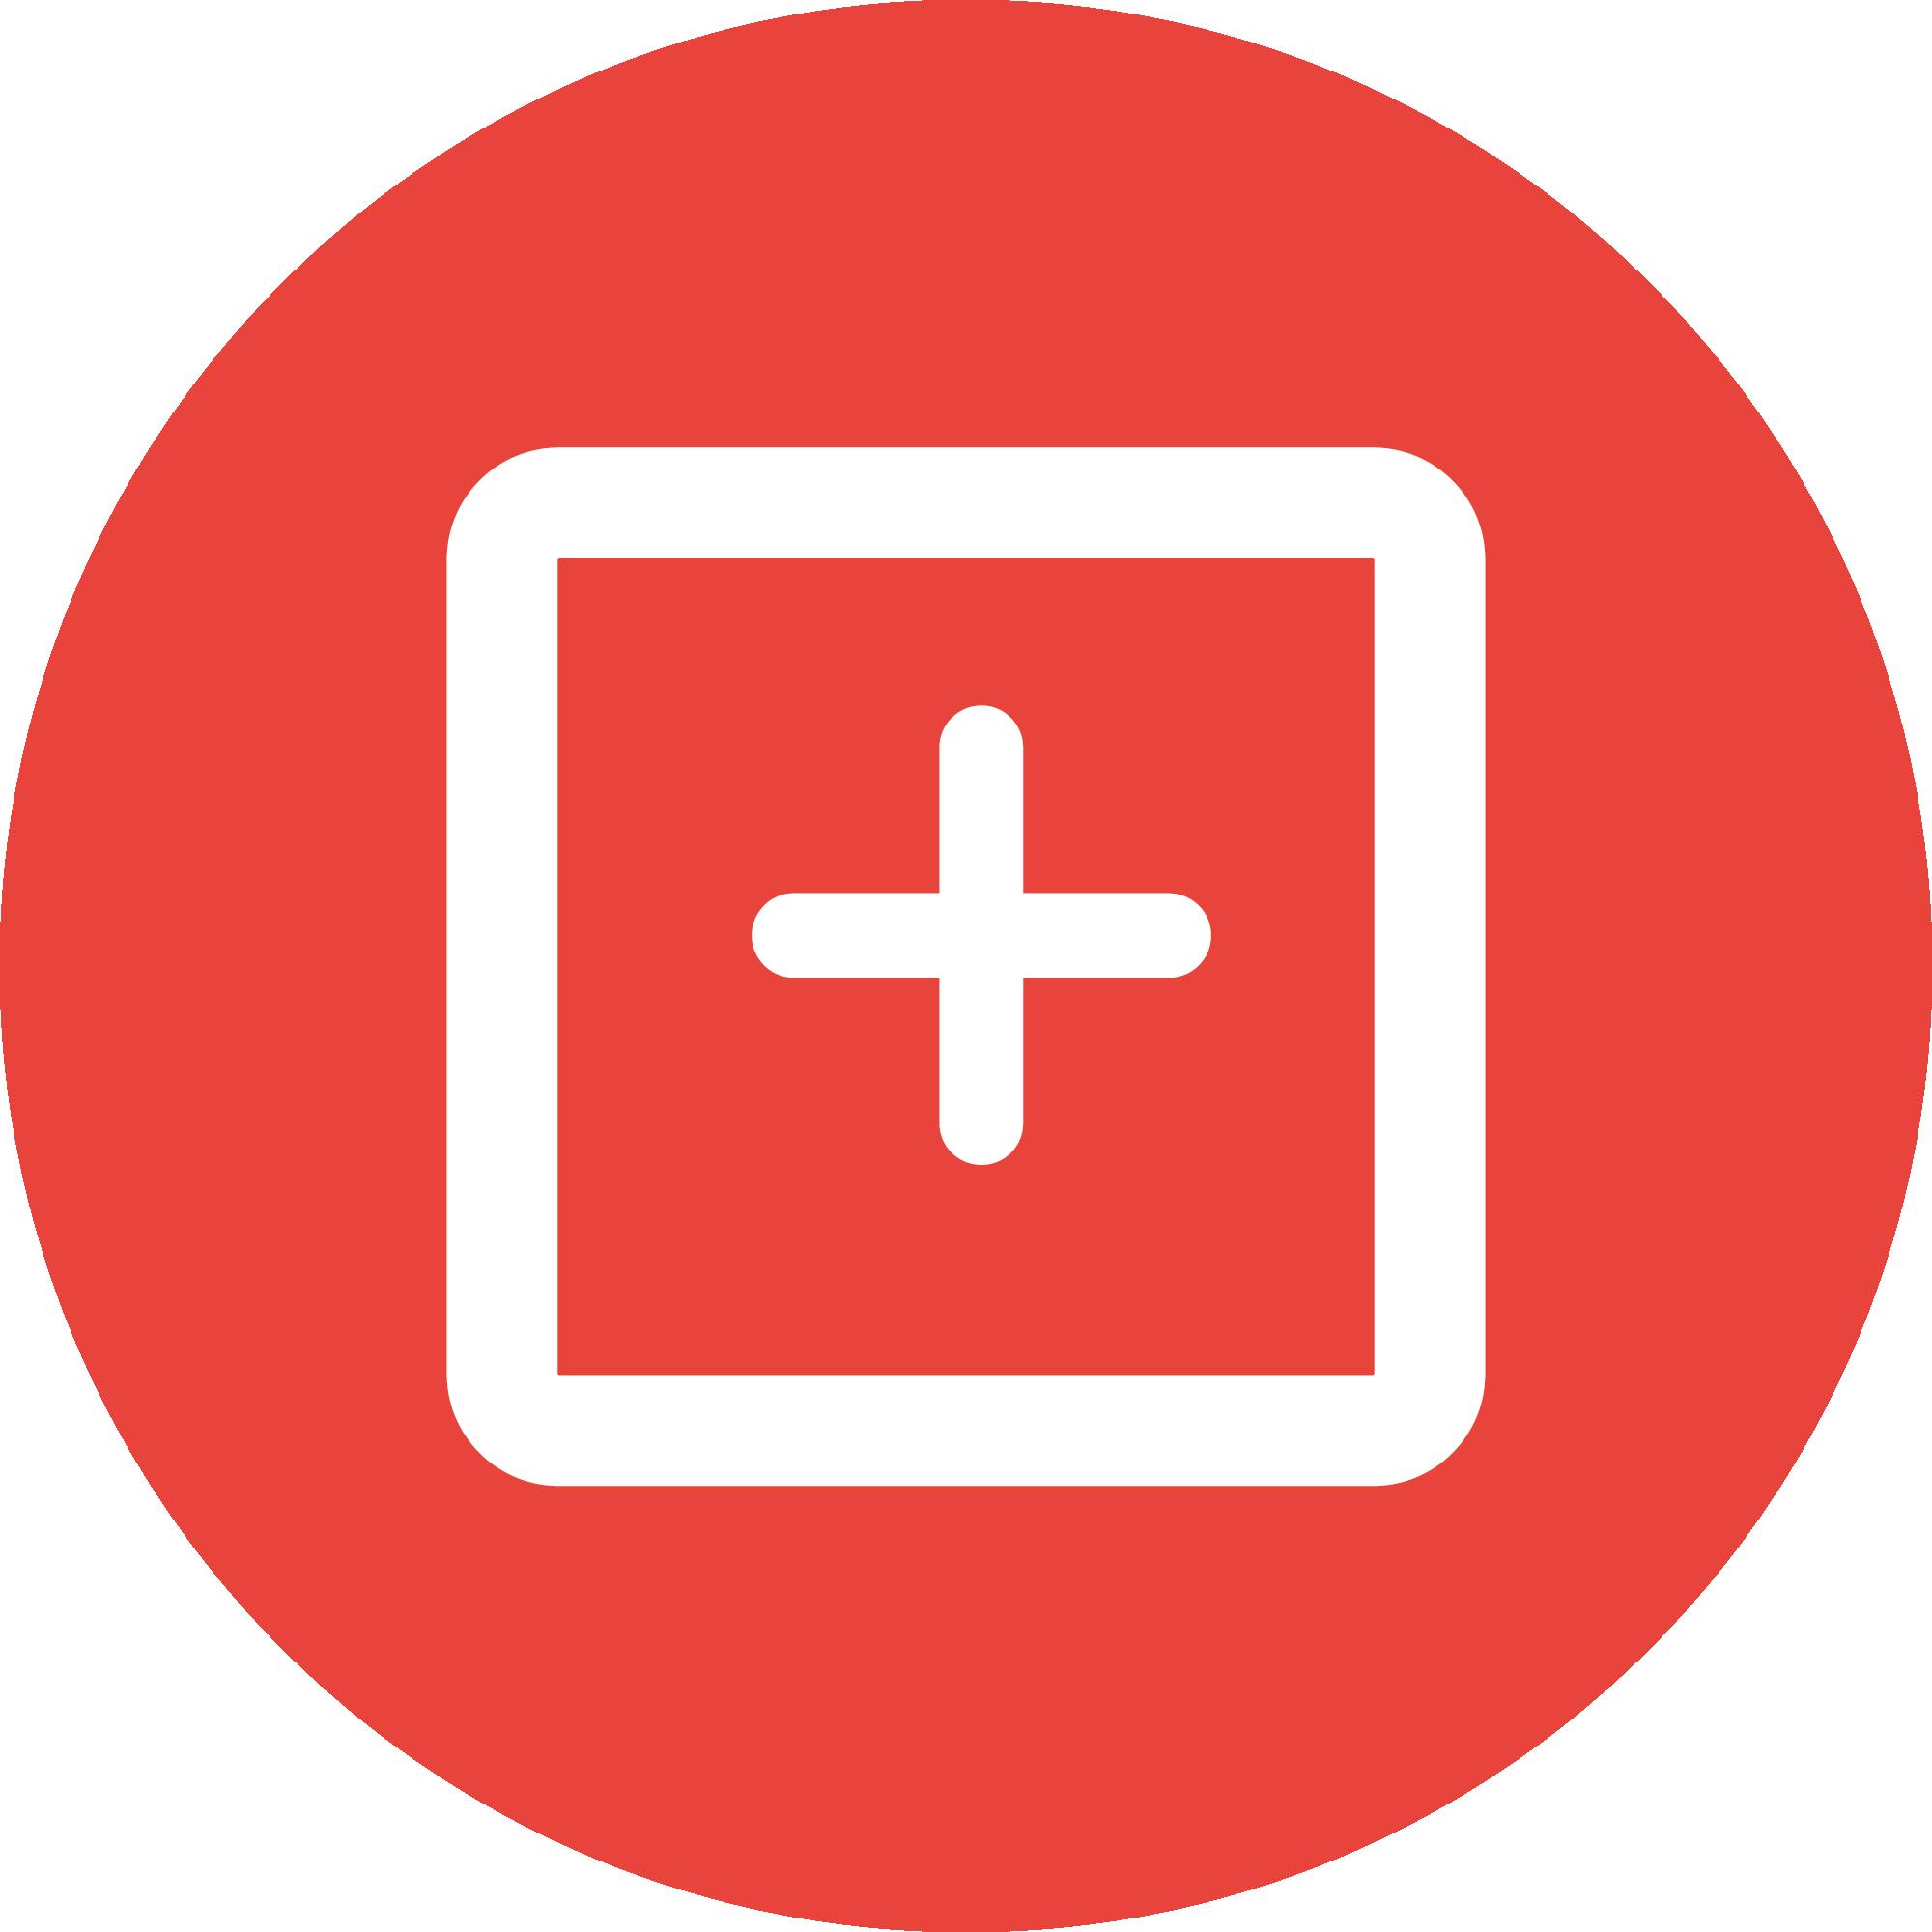 Ikon_Totalpakken